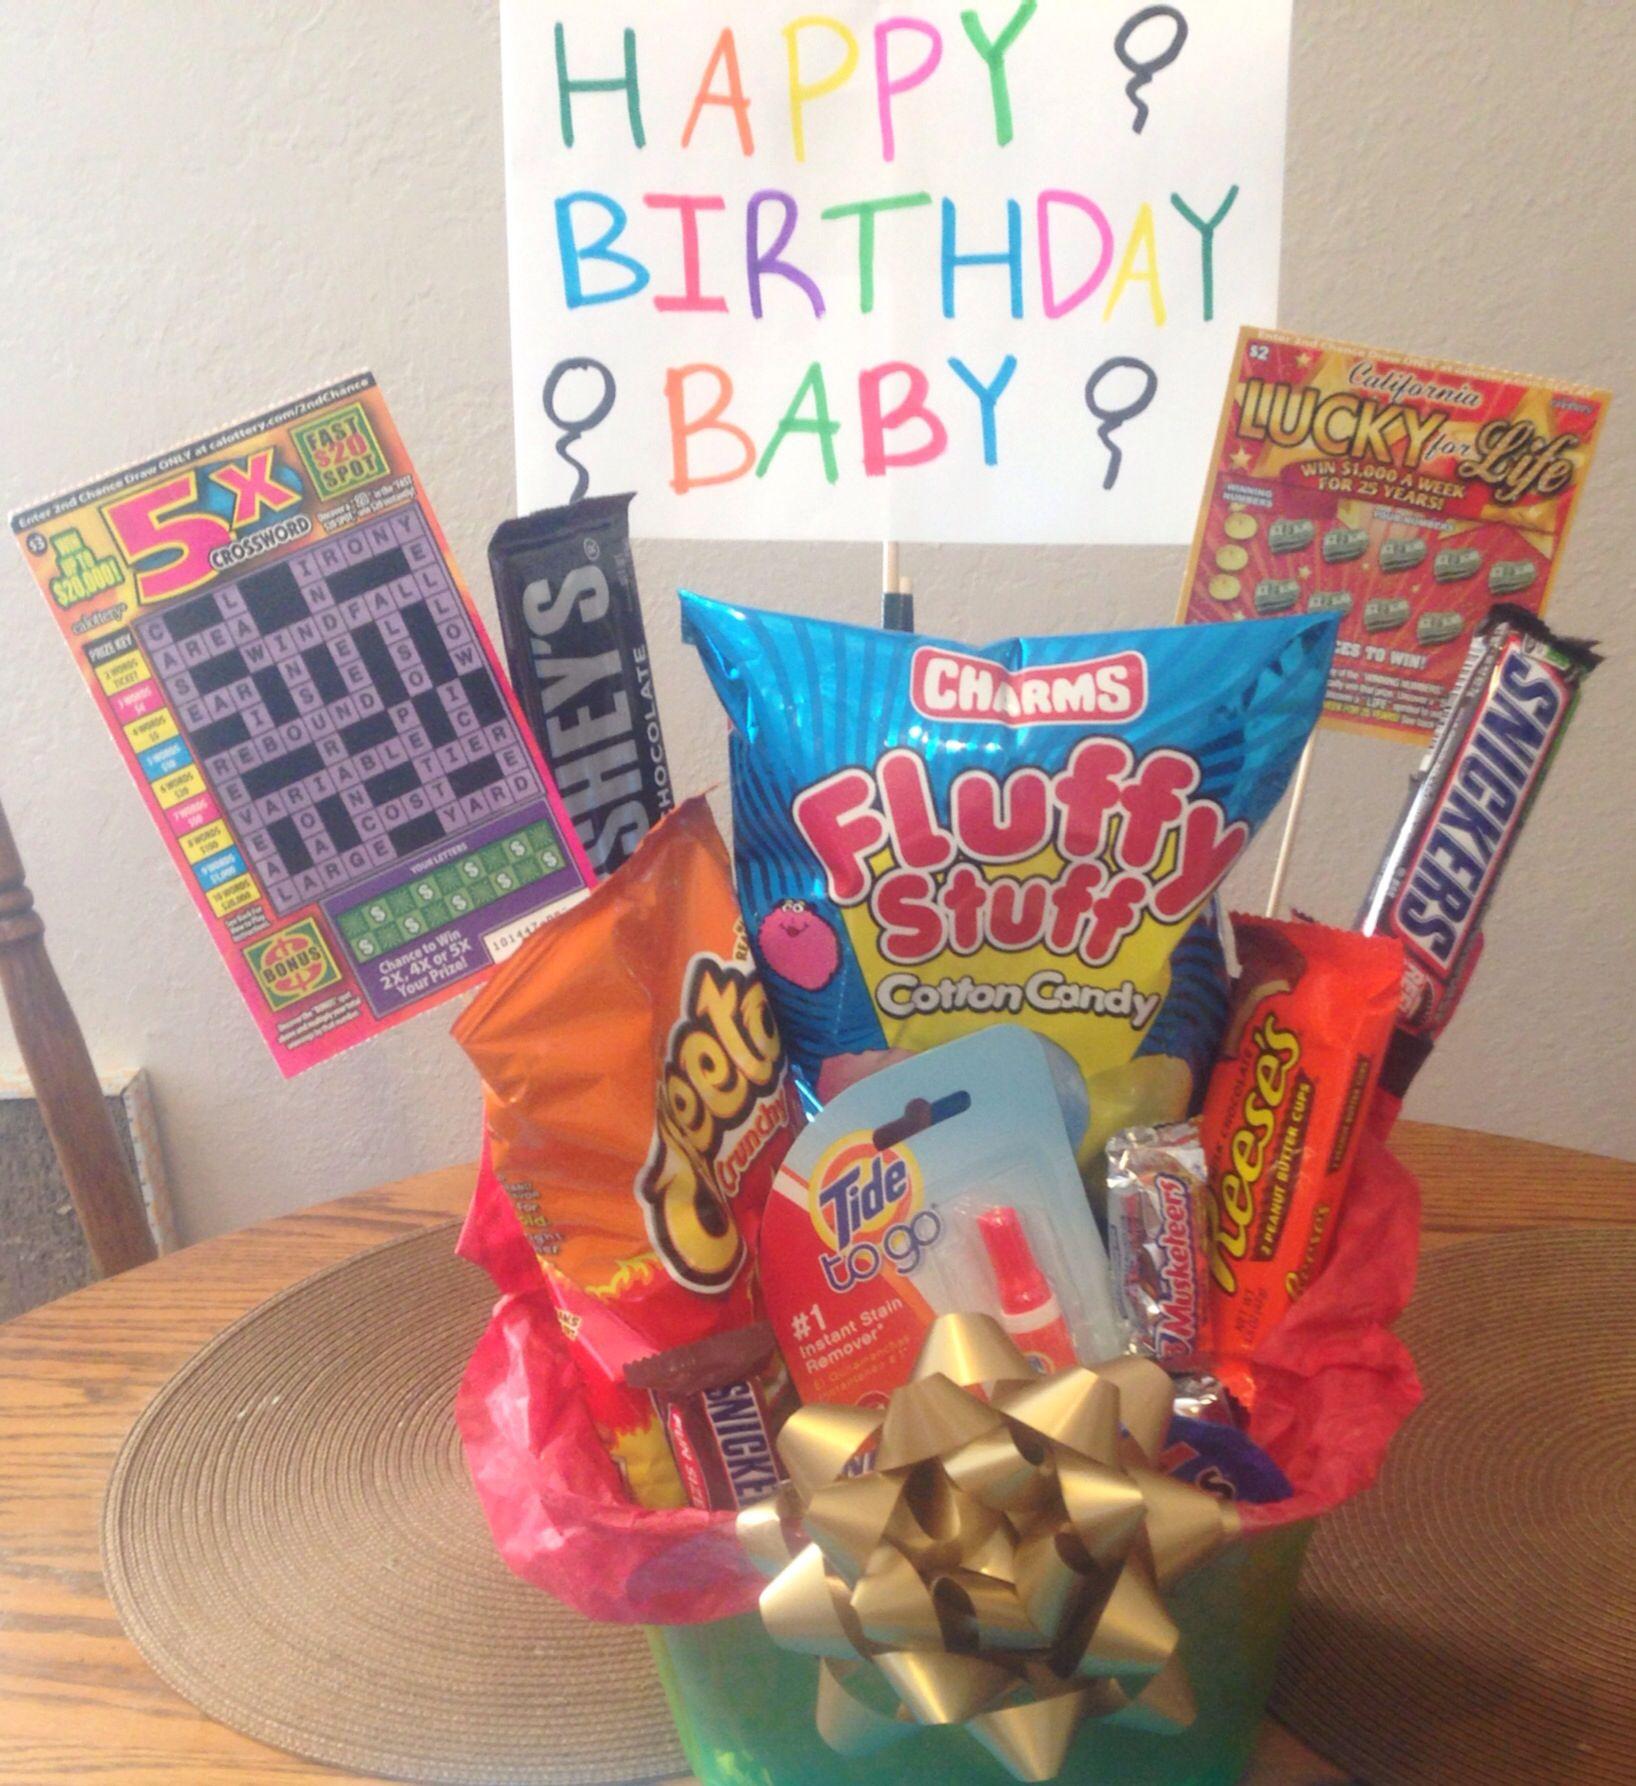 Gift Ideas For Boyfriend Birthday  Gift Ideas for Boyfriend Gift Ideas For Boyfriend Birthday 21